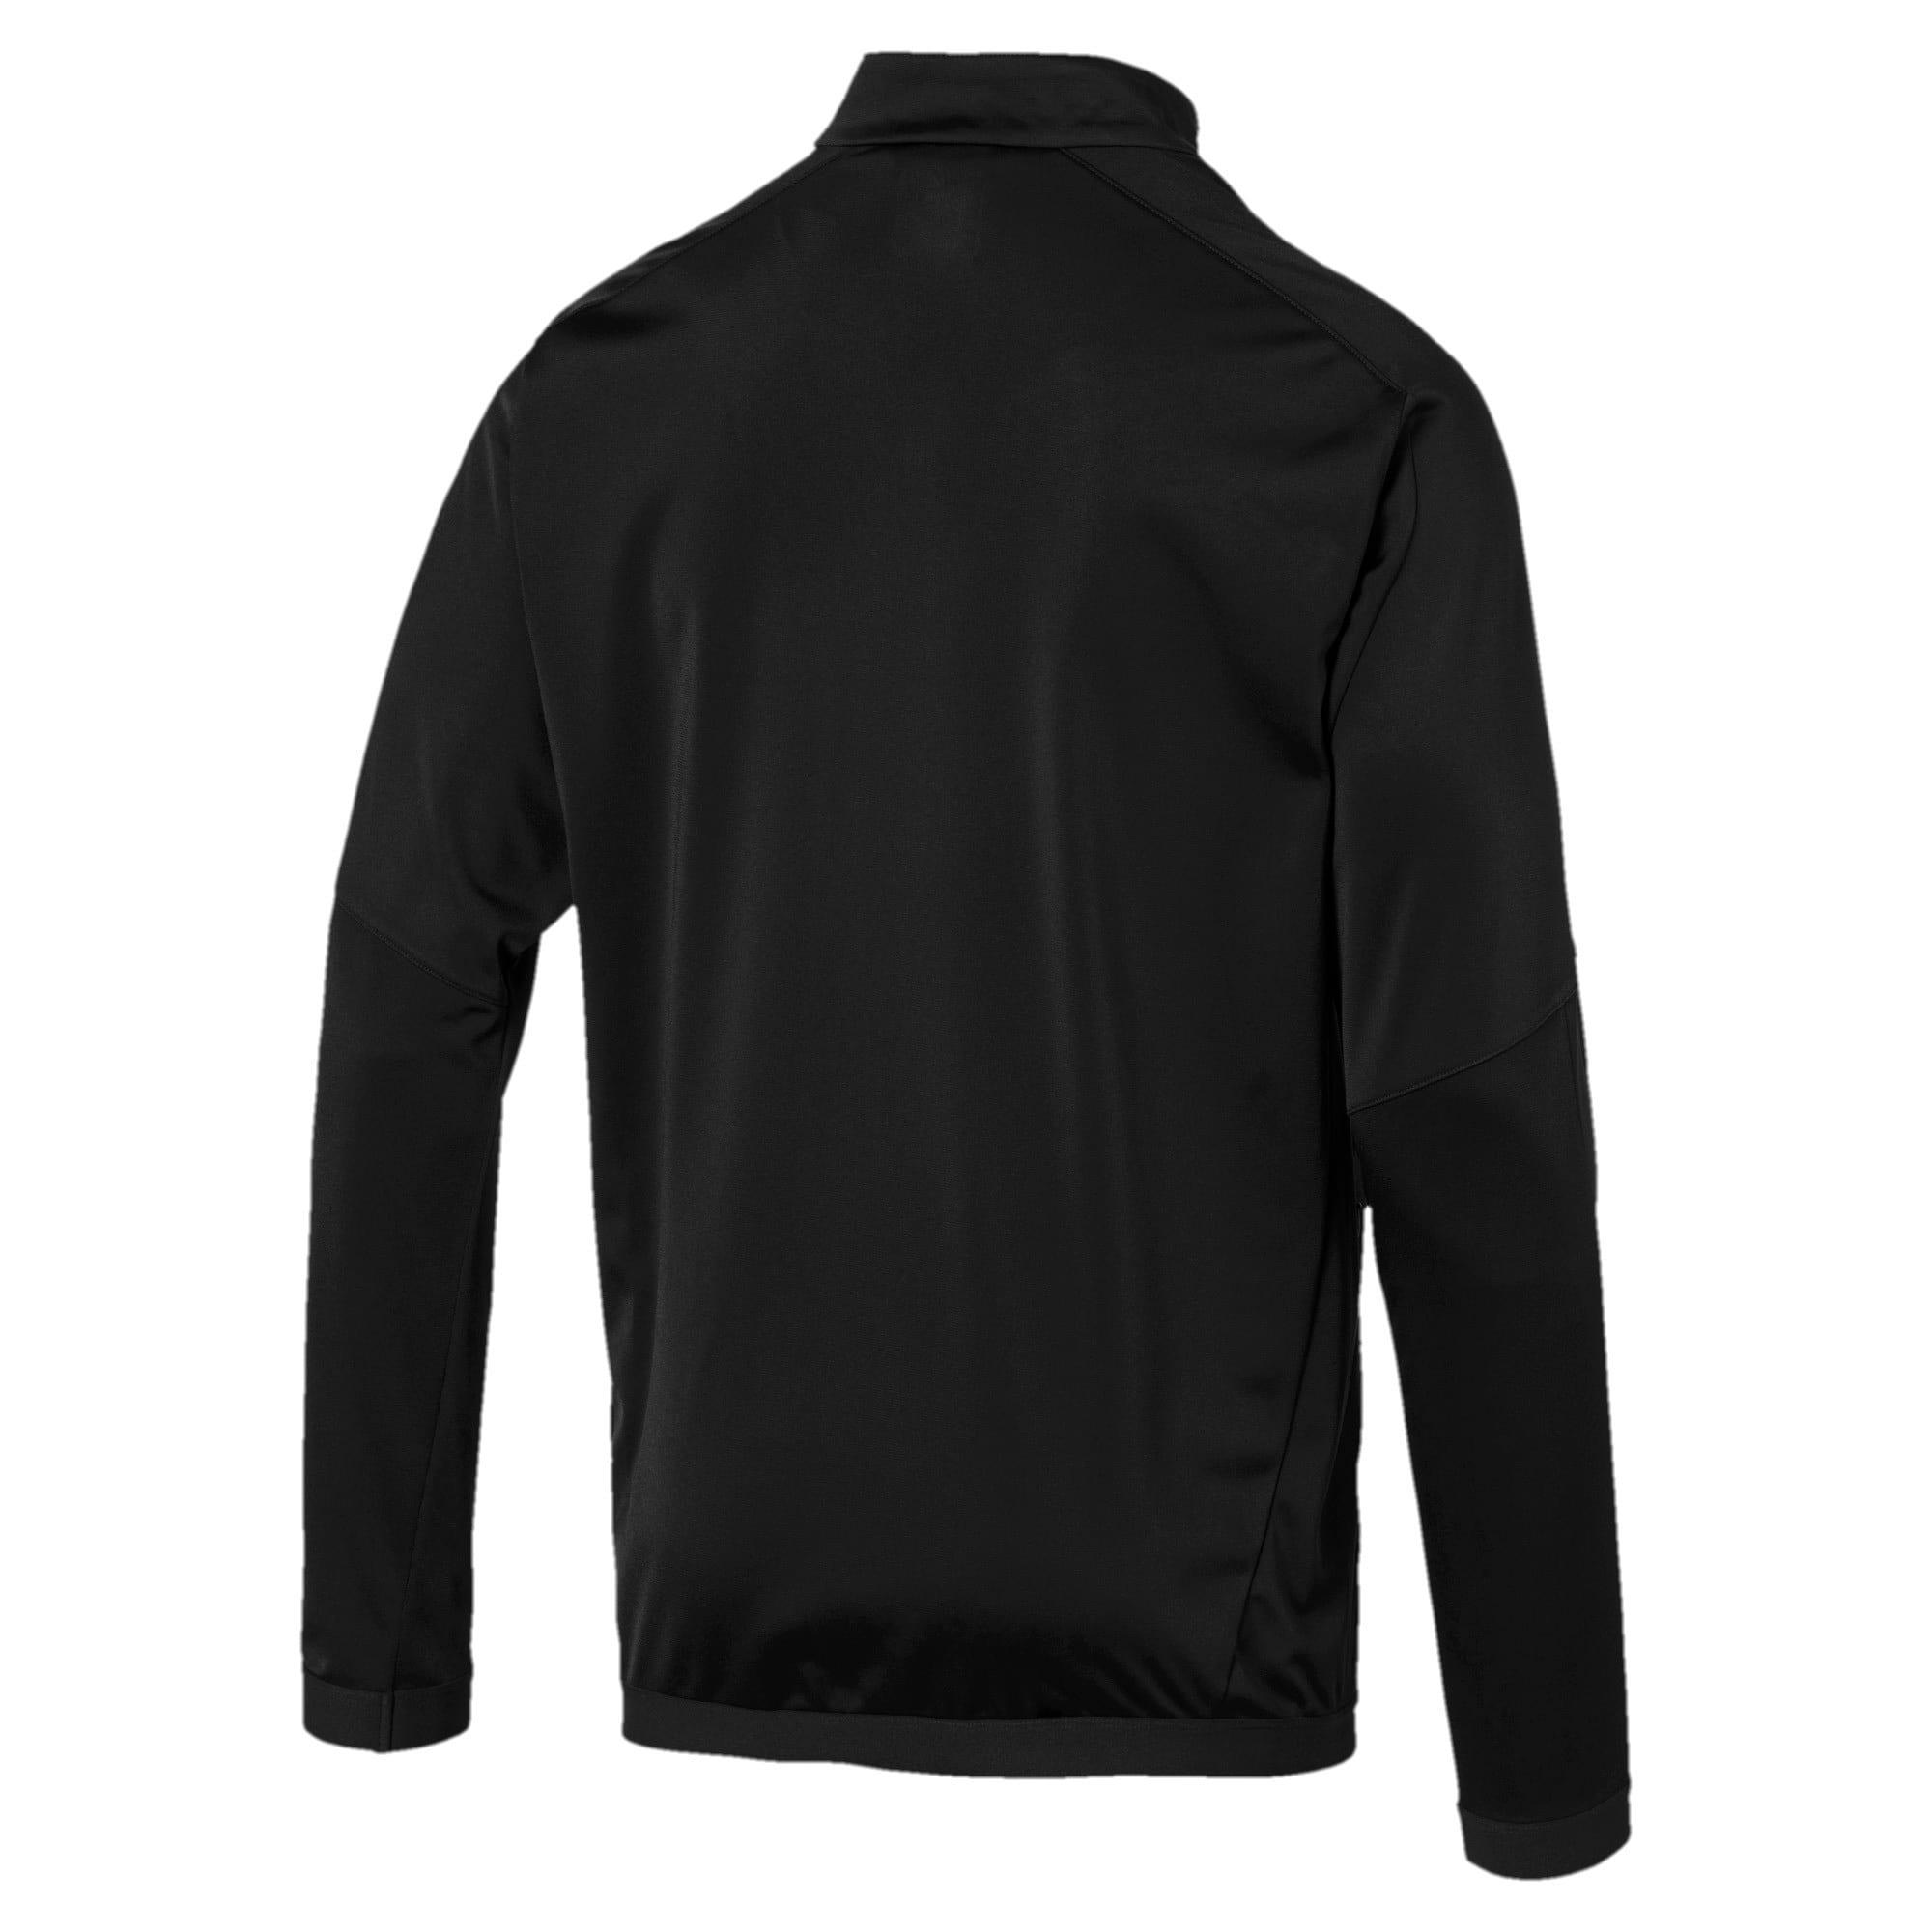 Thumbnail 3 of Man City Men's International Stadium Jacket, Puma Black-Georgia Peach, medium